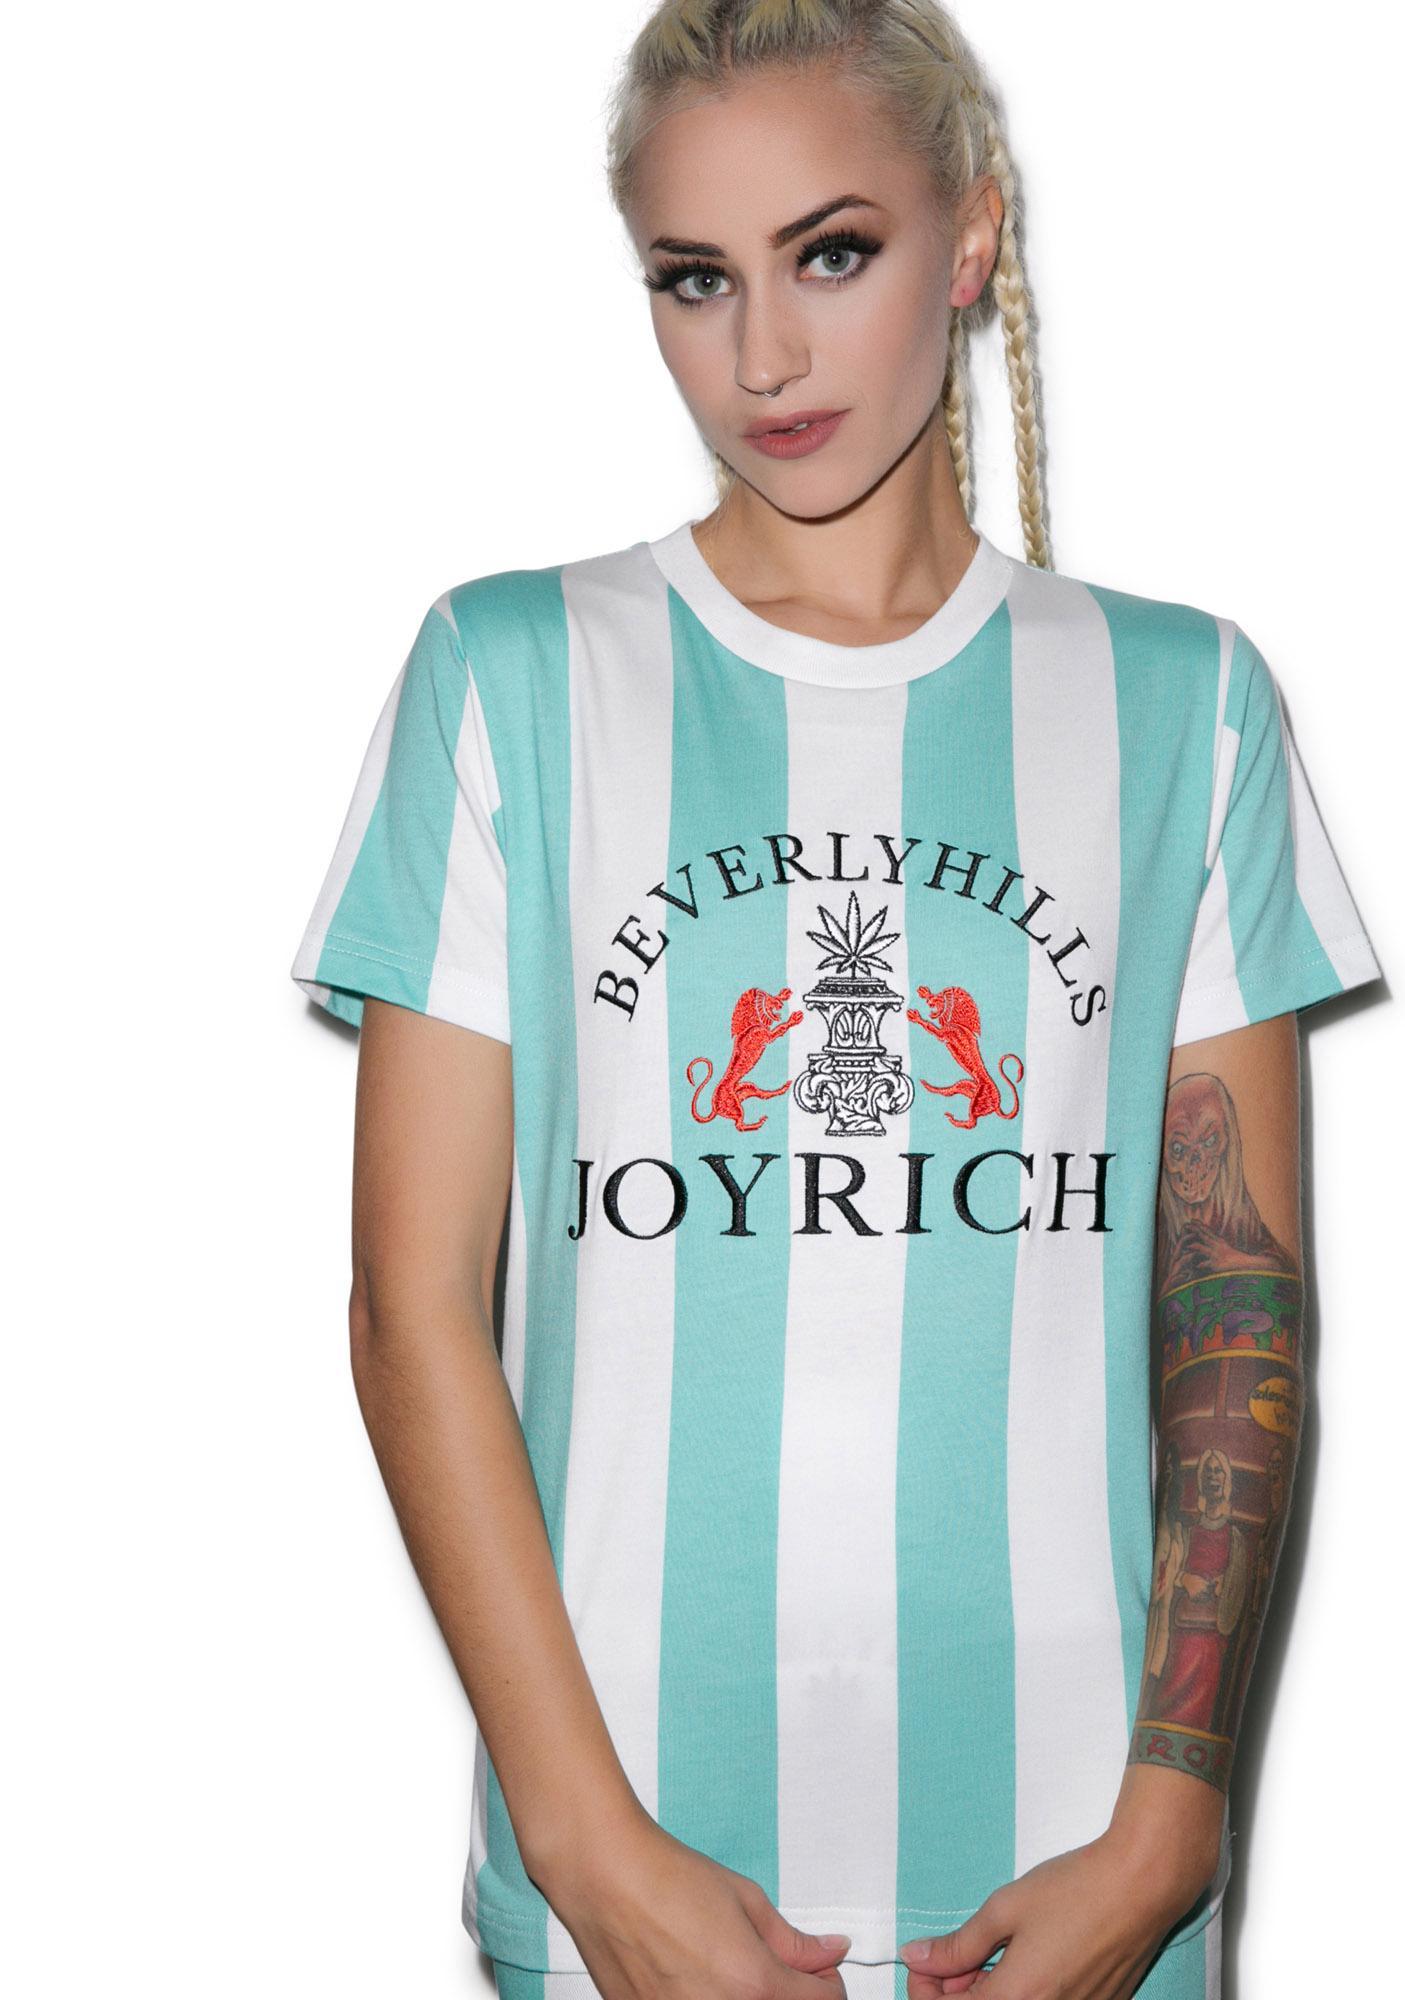 Joyrich Bold Lane Tee